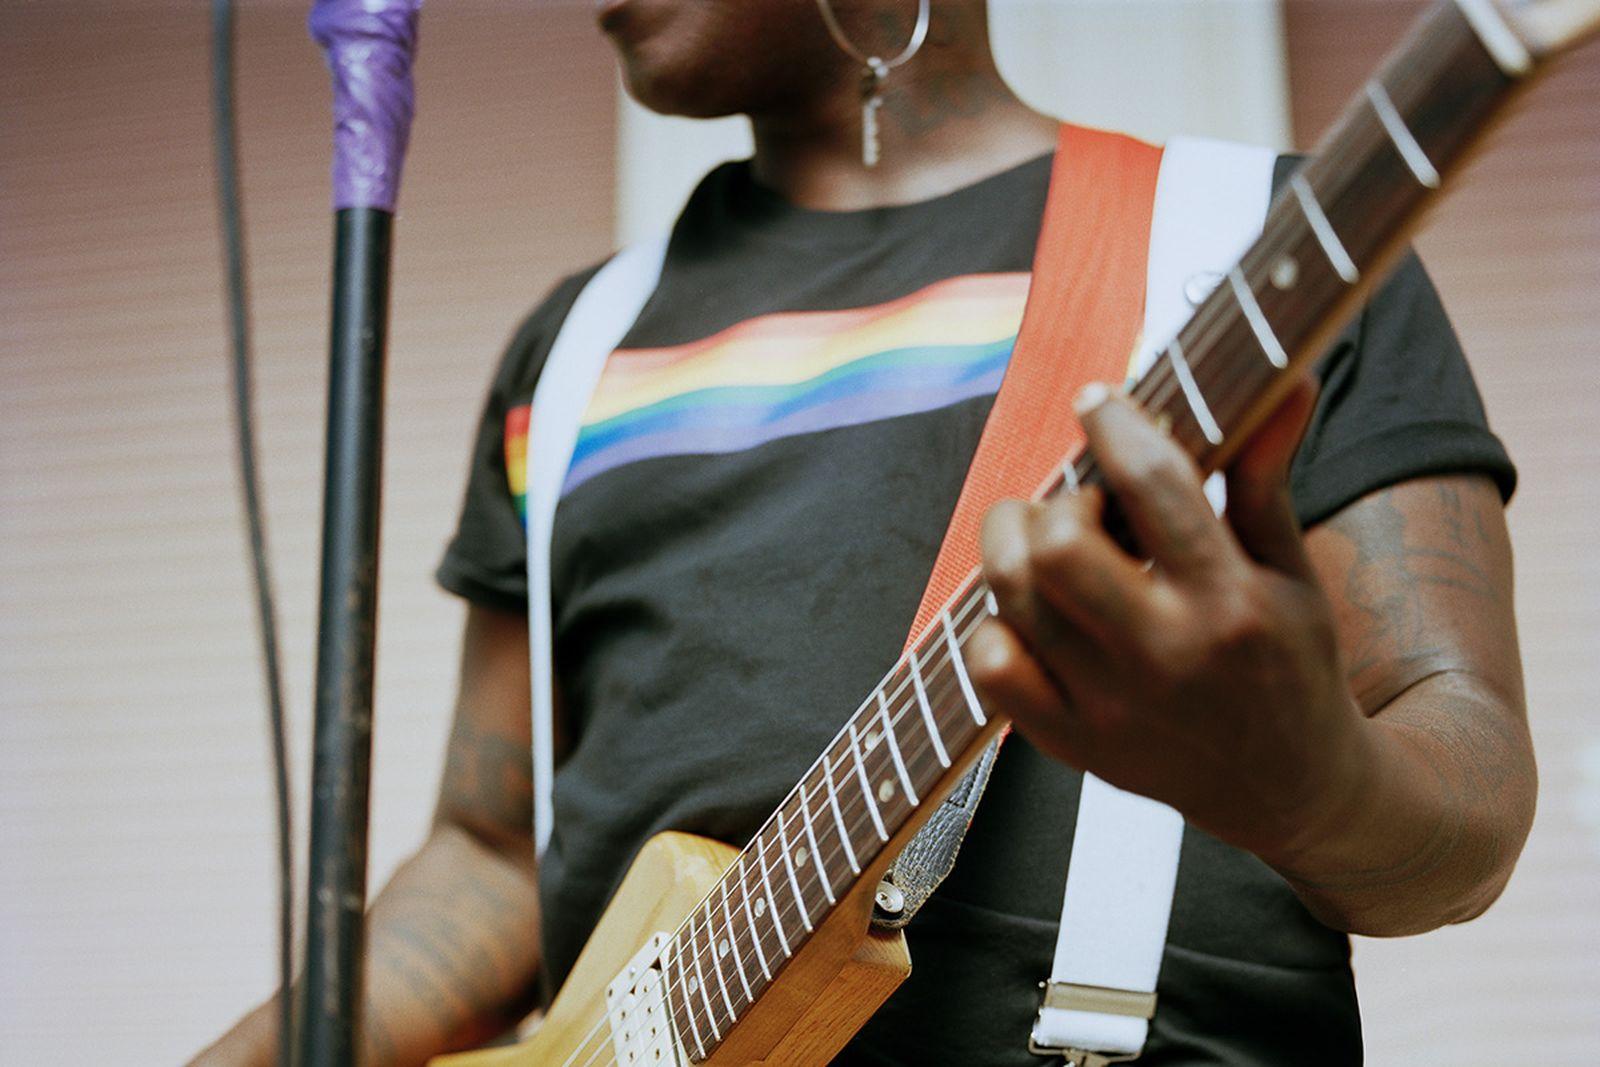 levis pride 2019 collection Levi's Pride Month